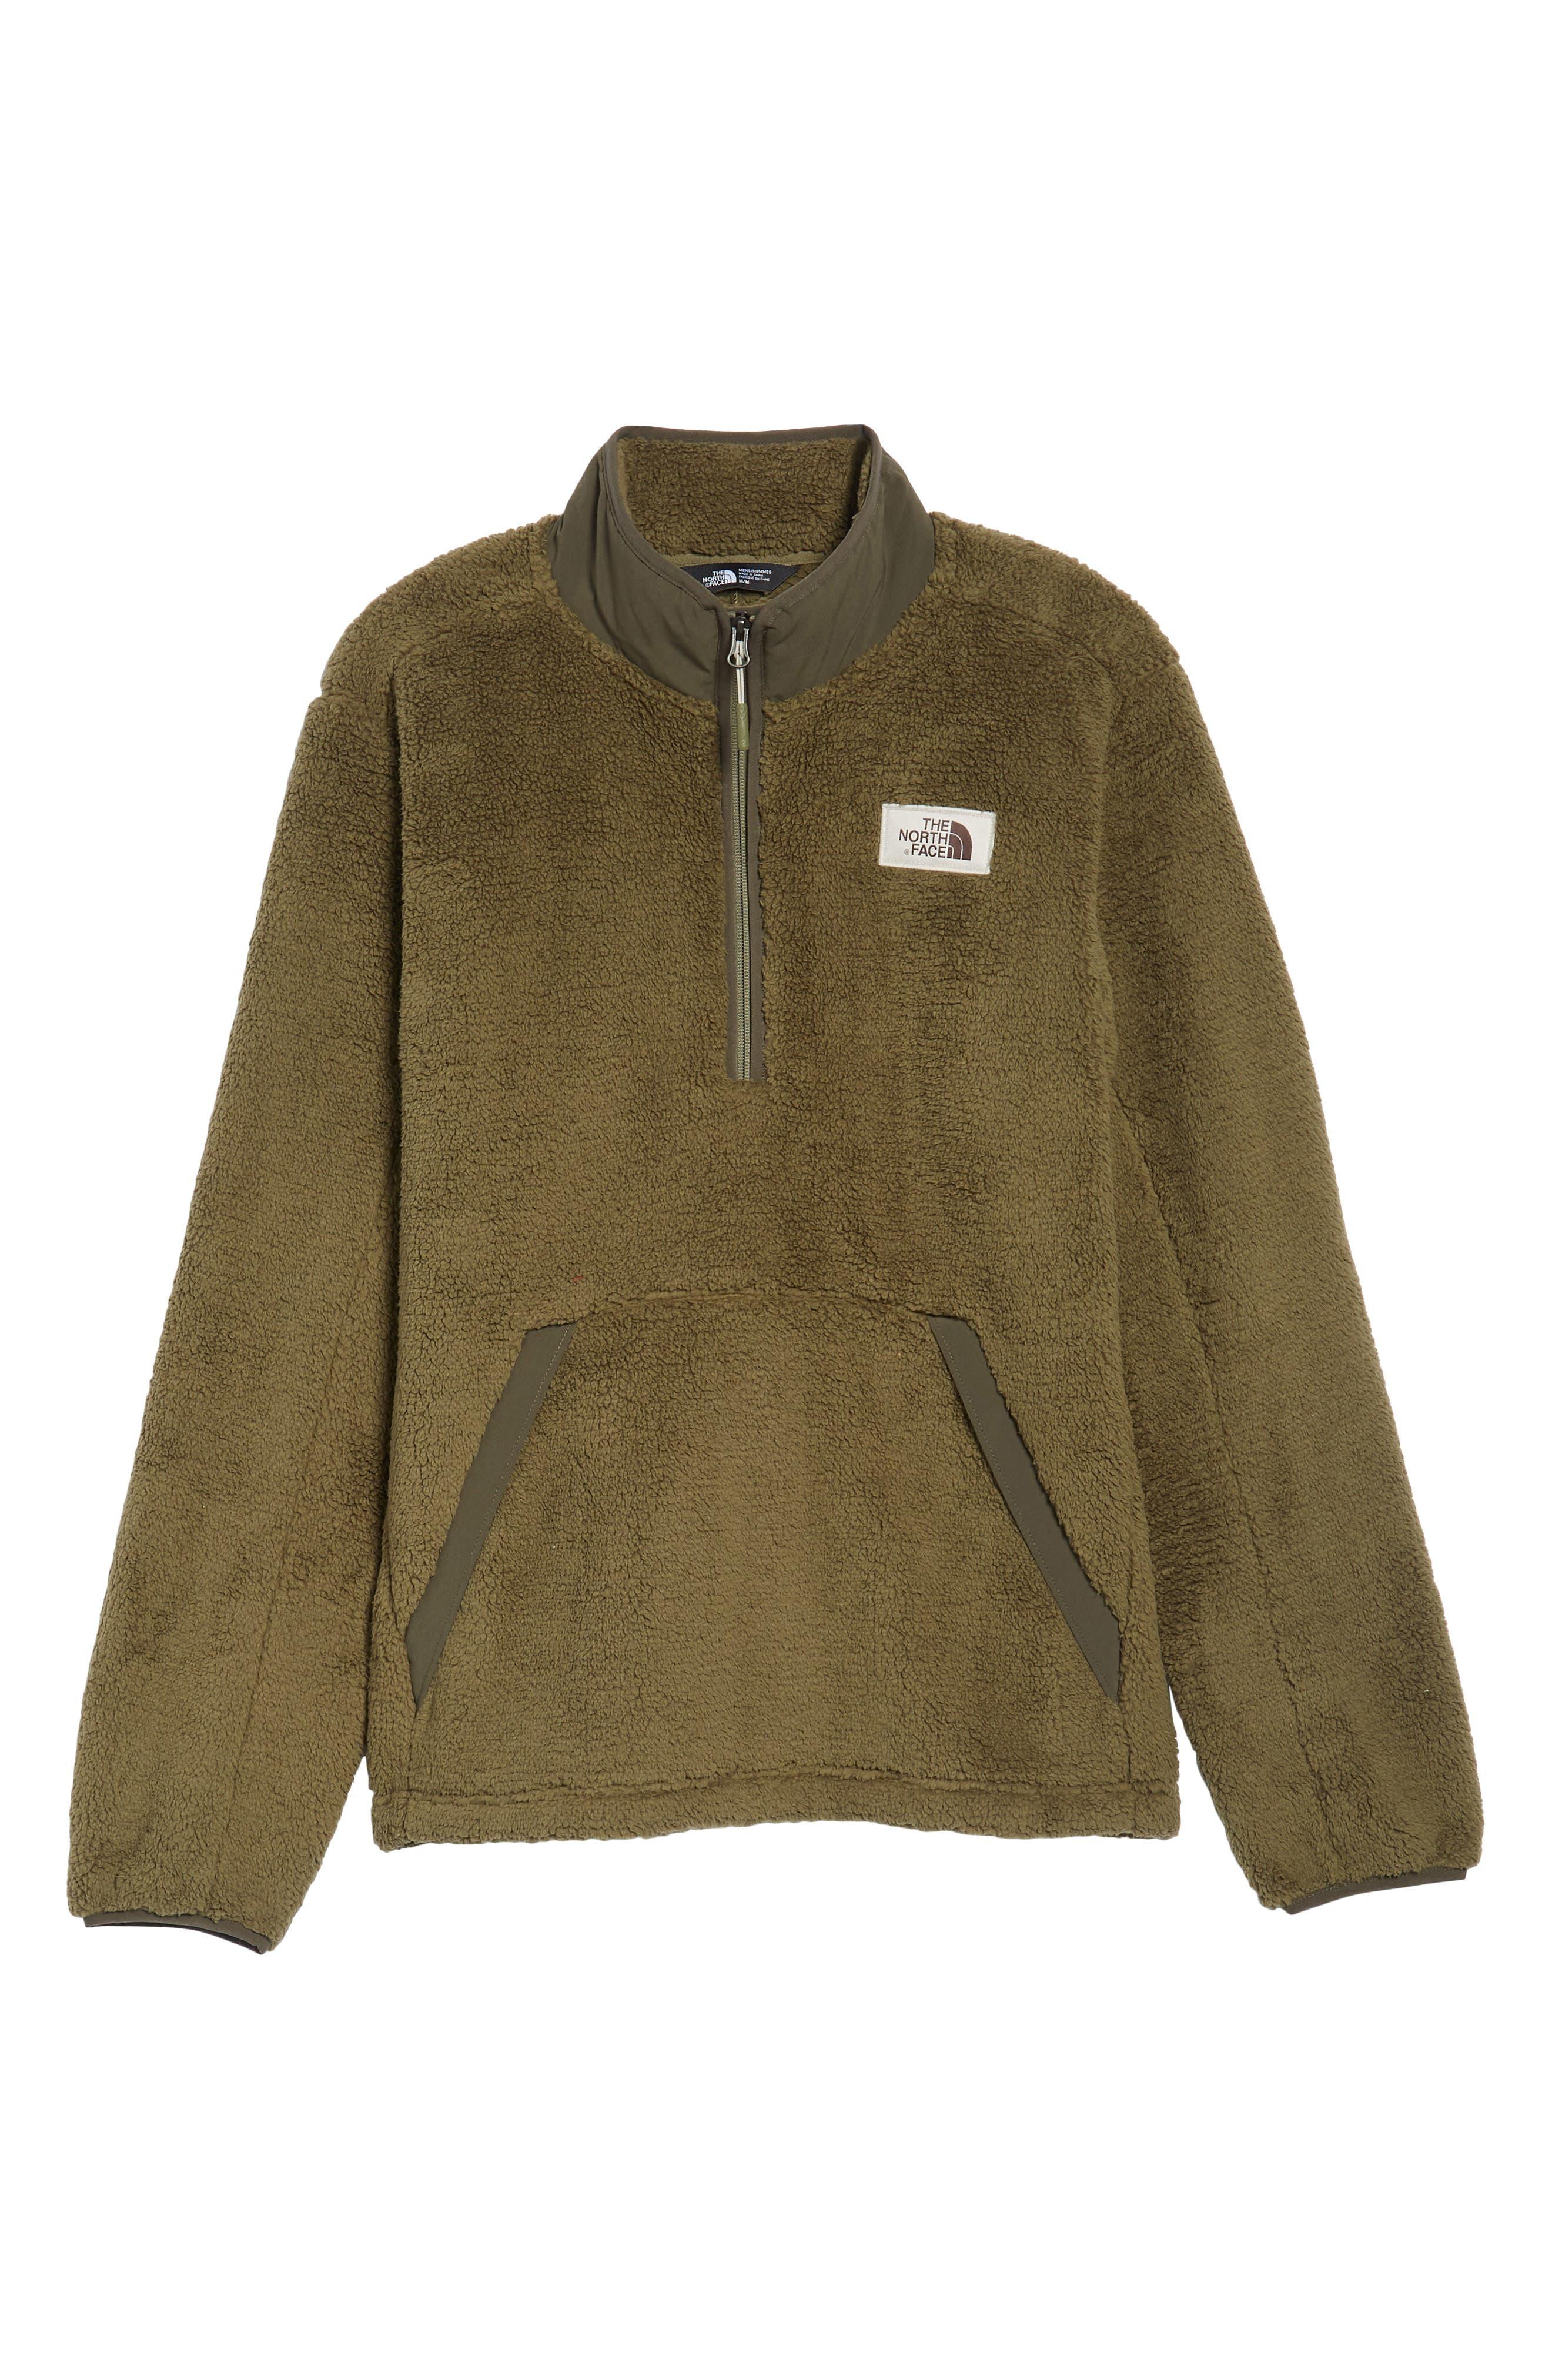 Khampfire Fleece Pullover,                             Alternate thumbnail 6, color,                             301